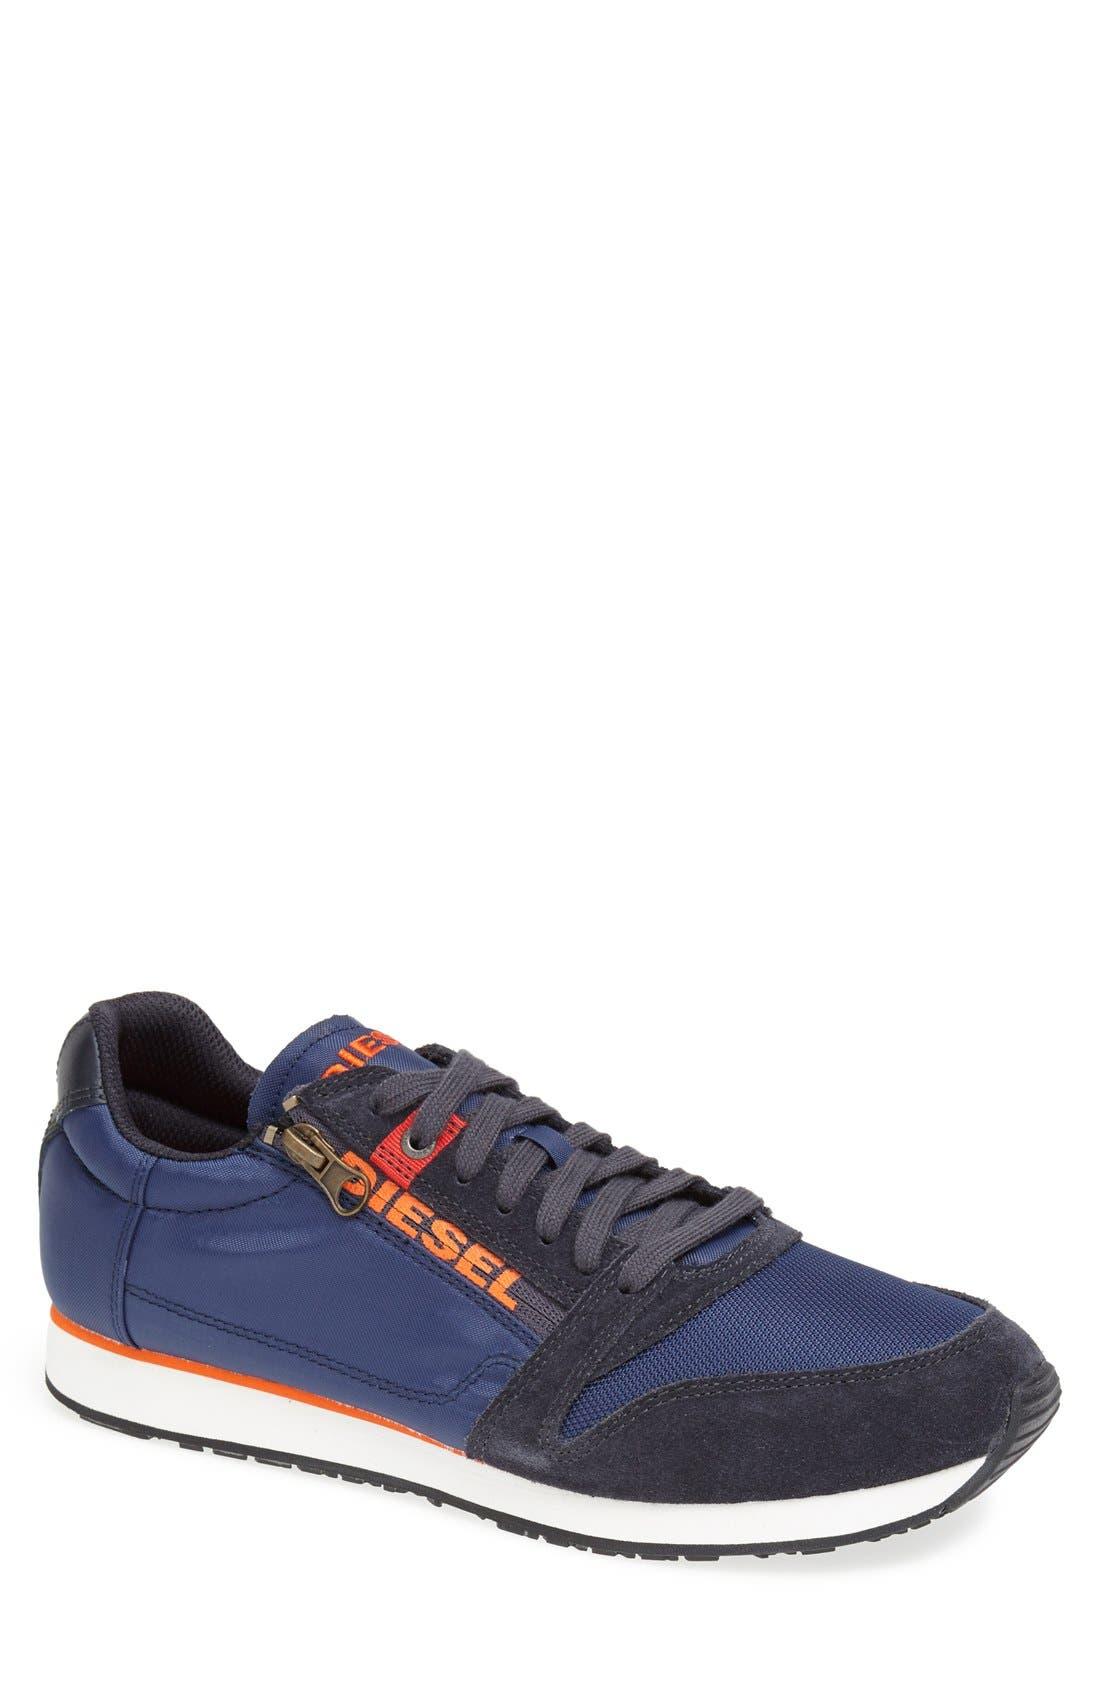 'Black Jake Slocker' Sneaker,                             Main thumbnail 1, color,                             400